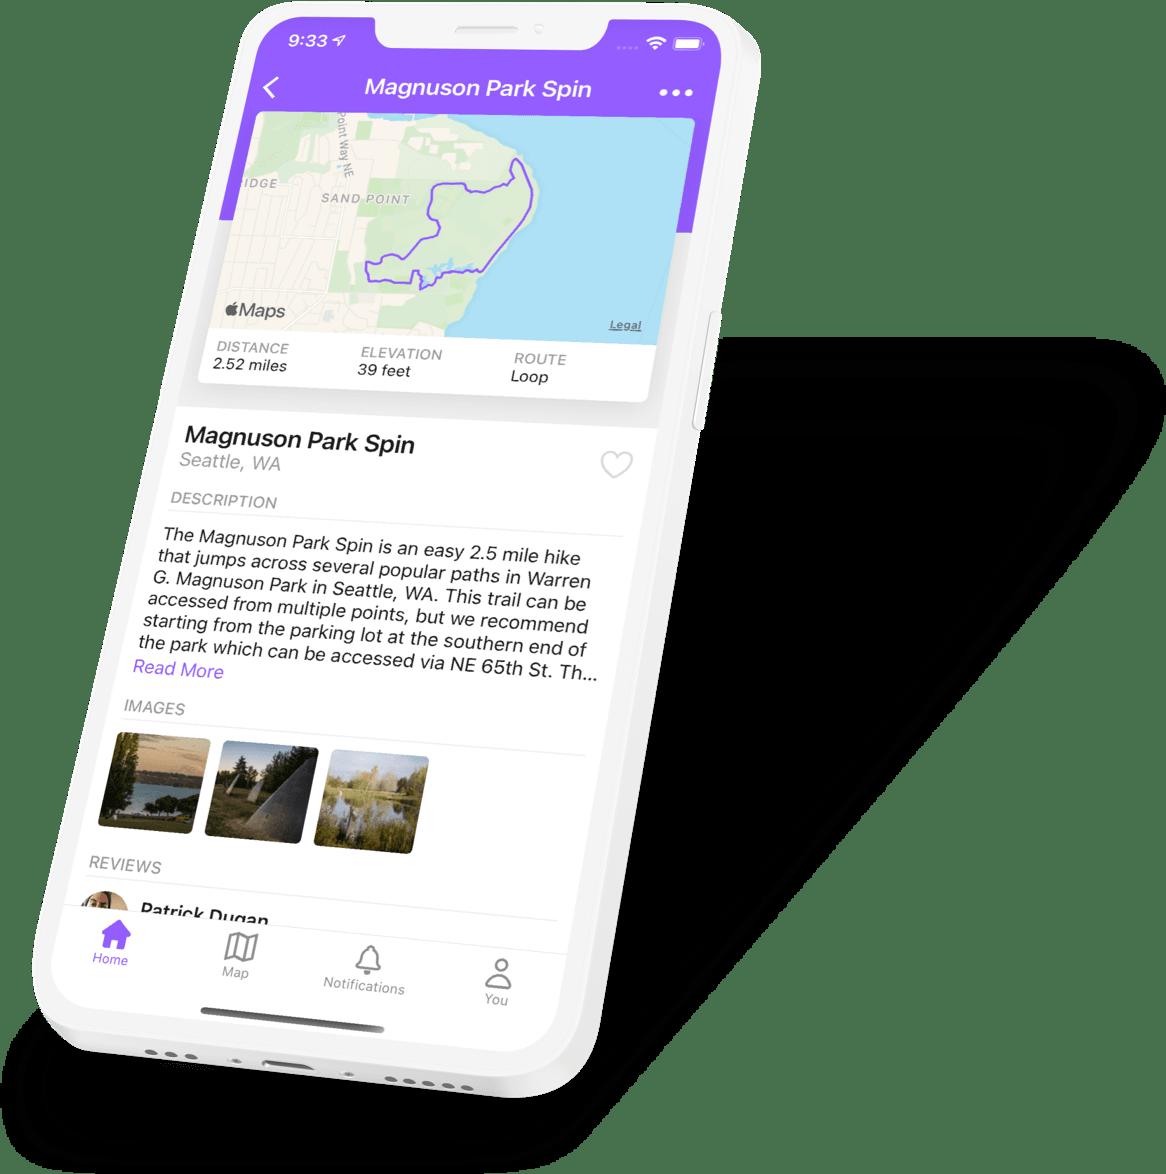 An image of the Hikearound iOS app